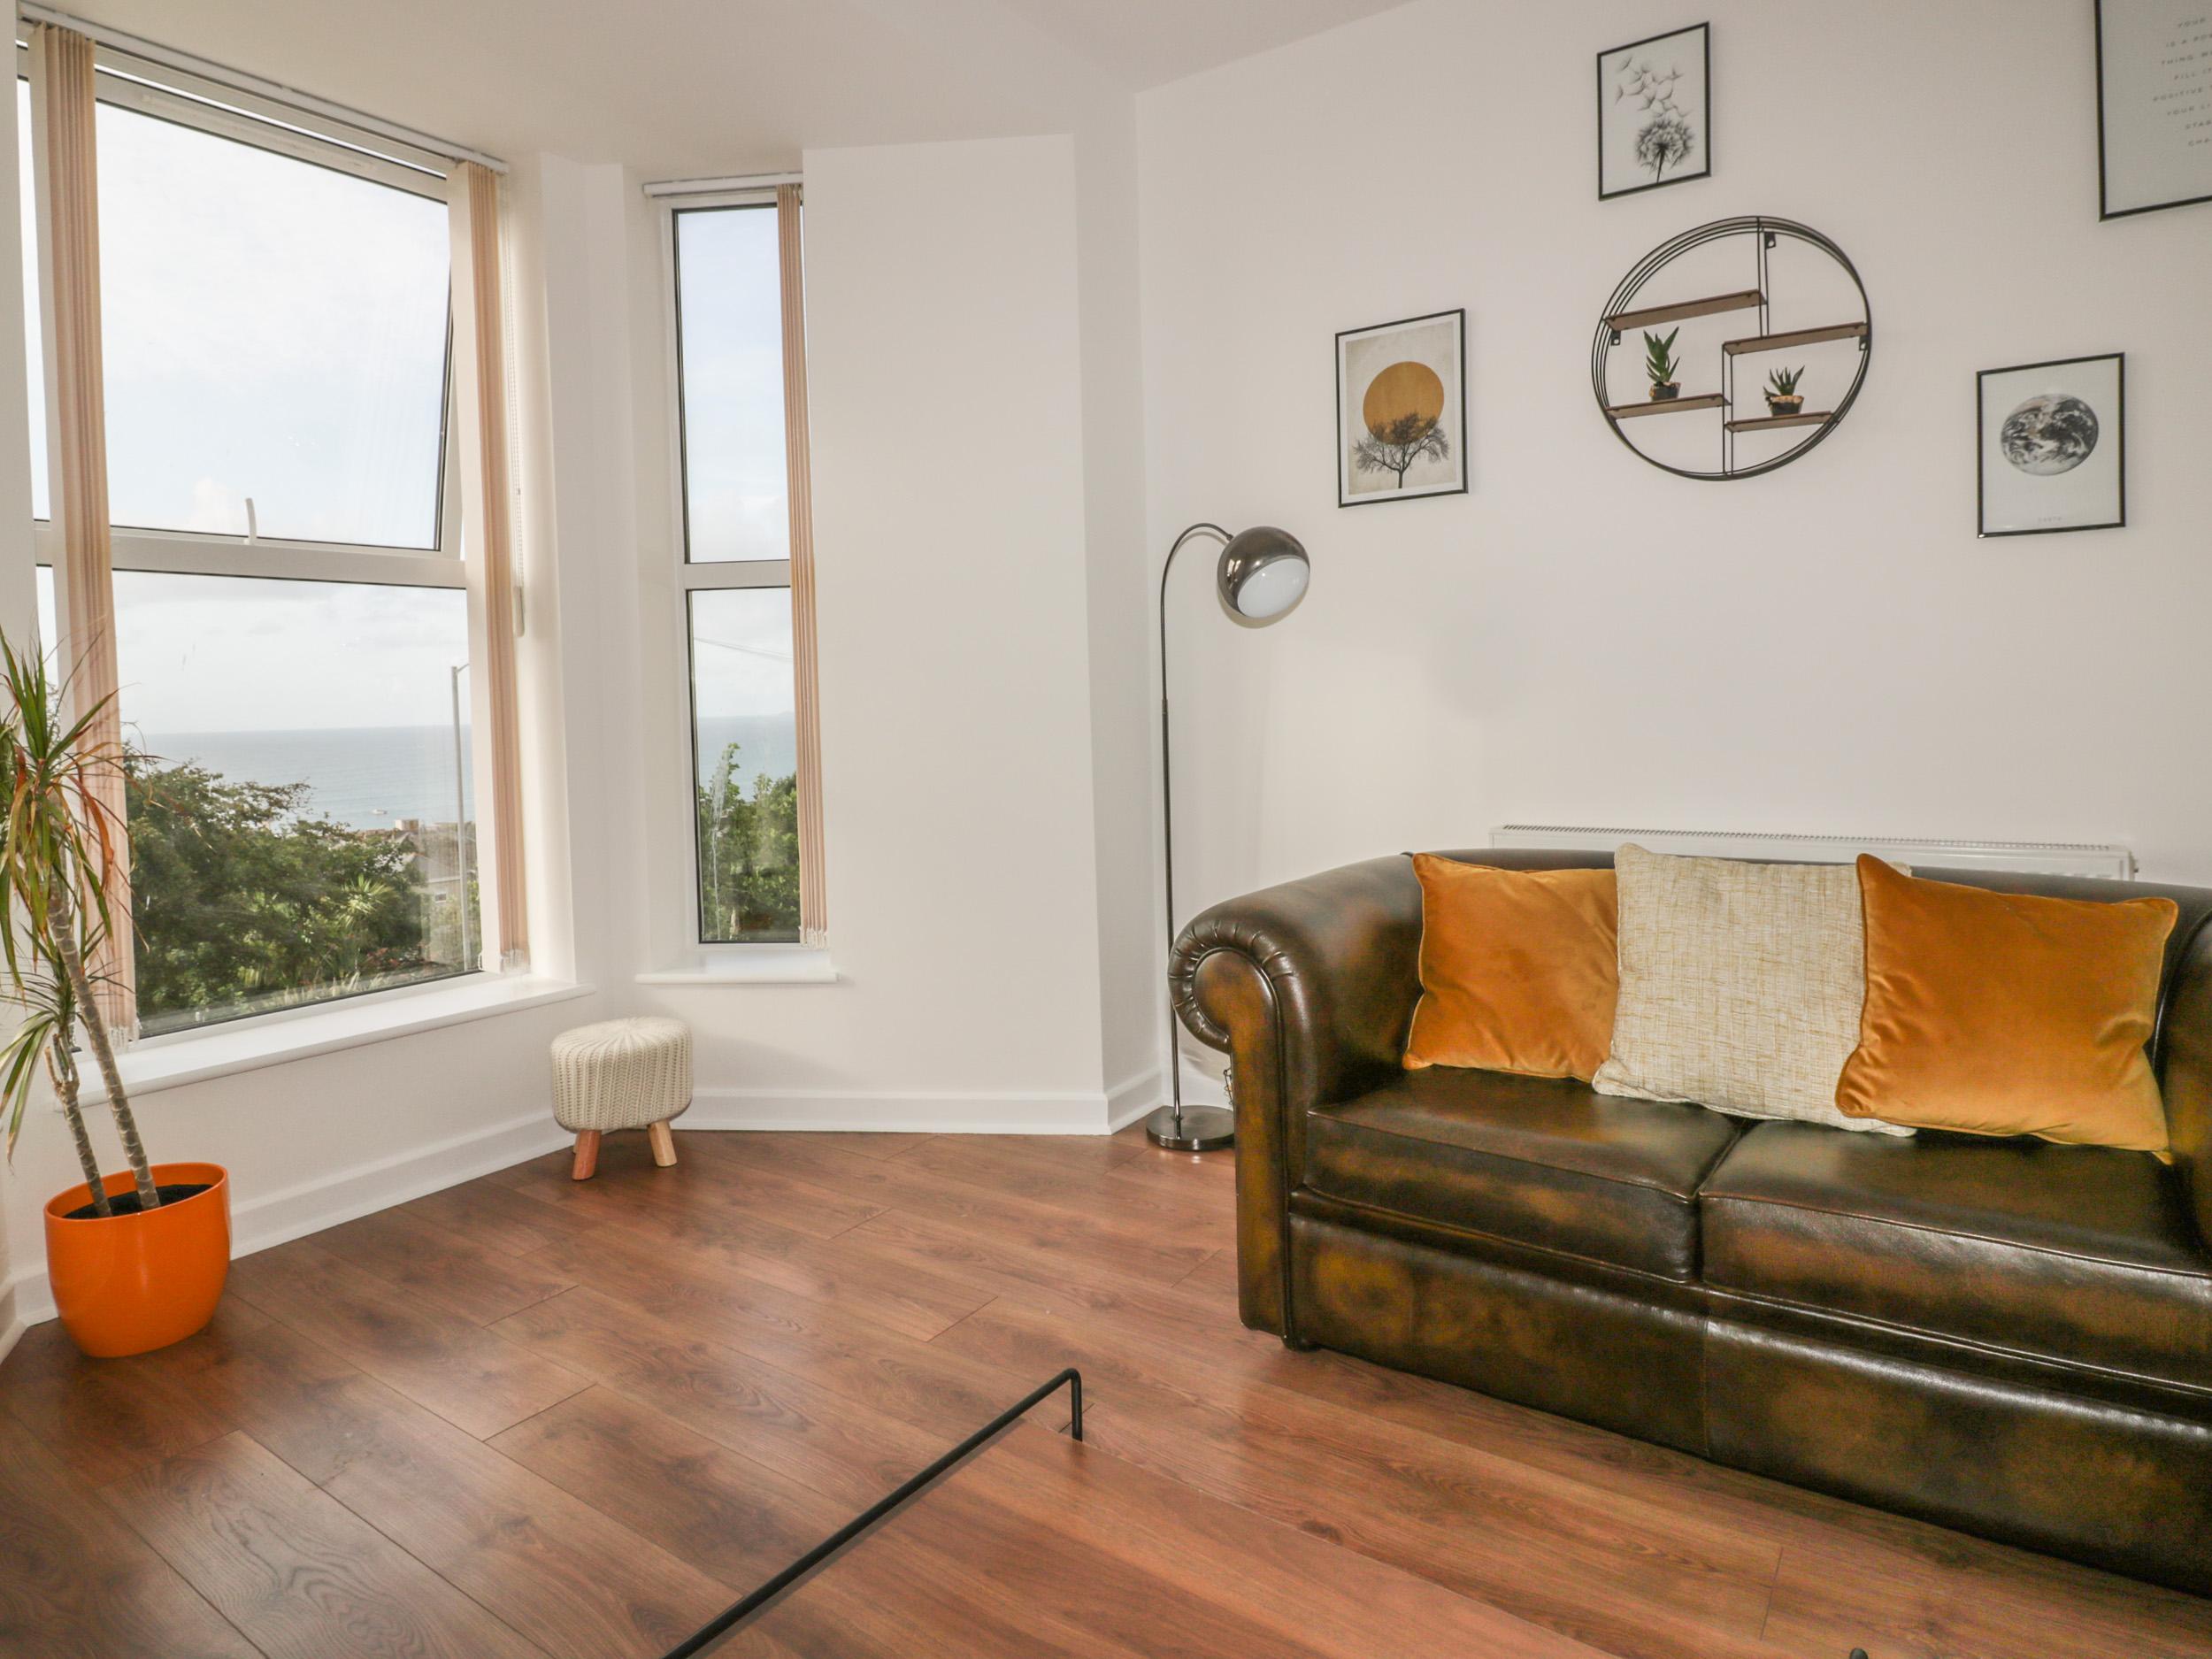 4 St. Georges Apartments, Crantock, Cornwall